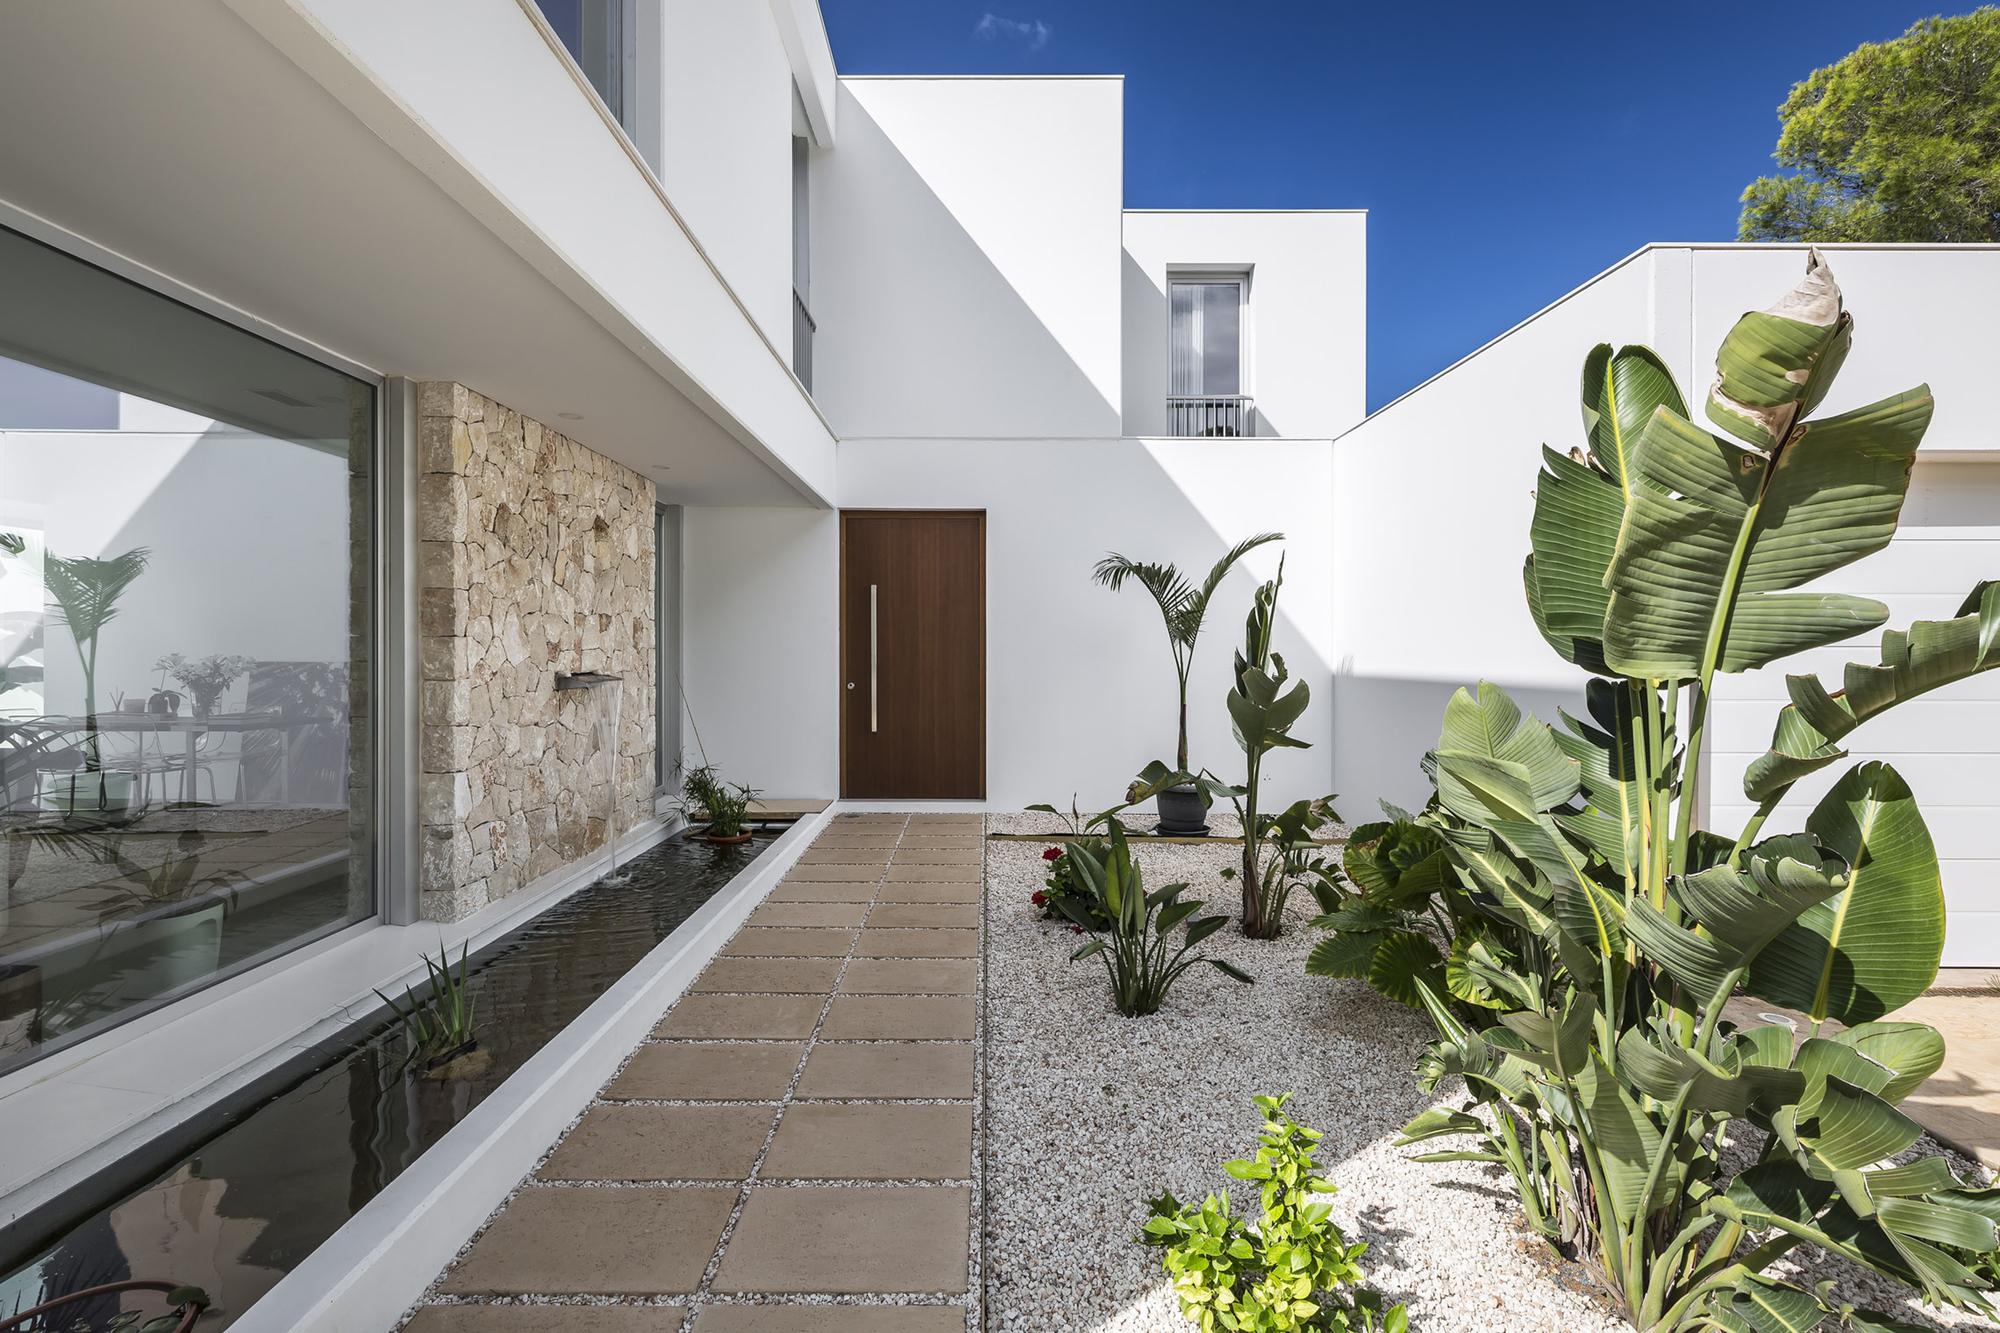 Up26 vivienda ubiko viraje arquitectura plataforma for Definicion exterior